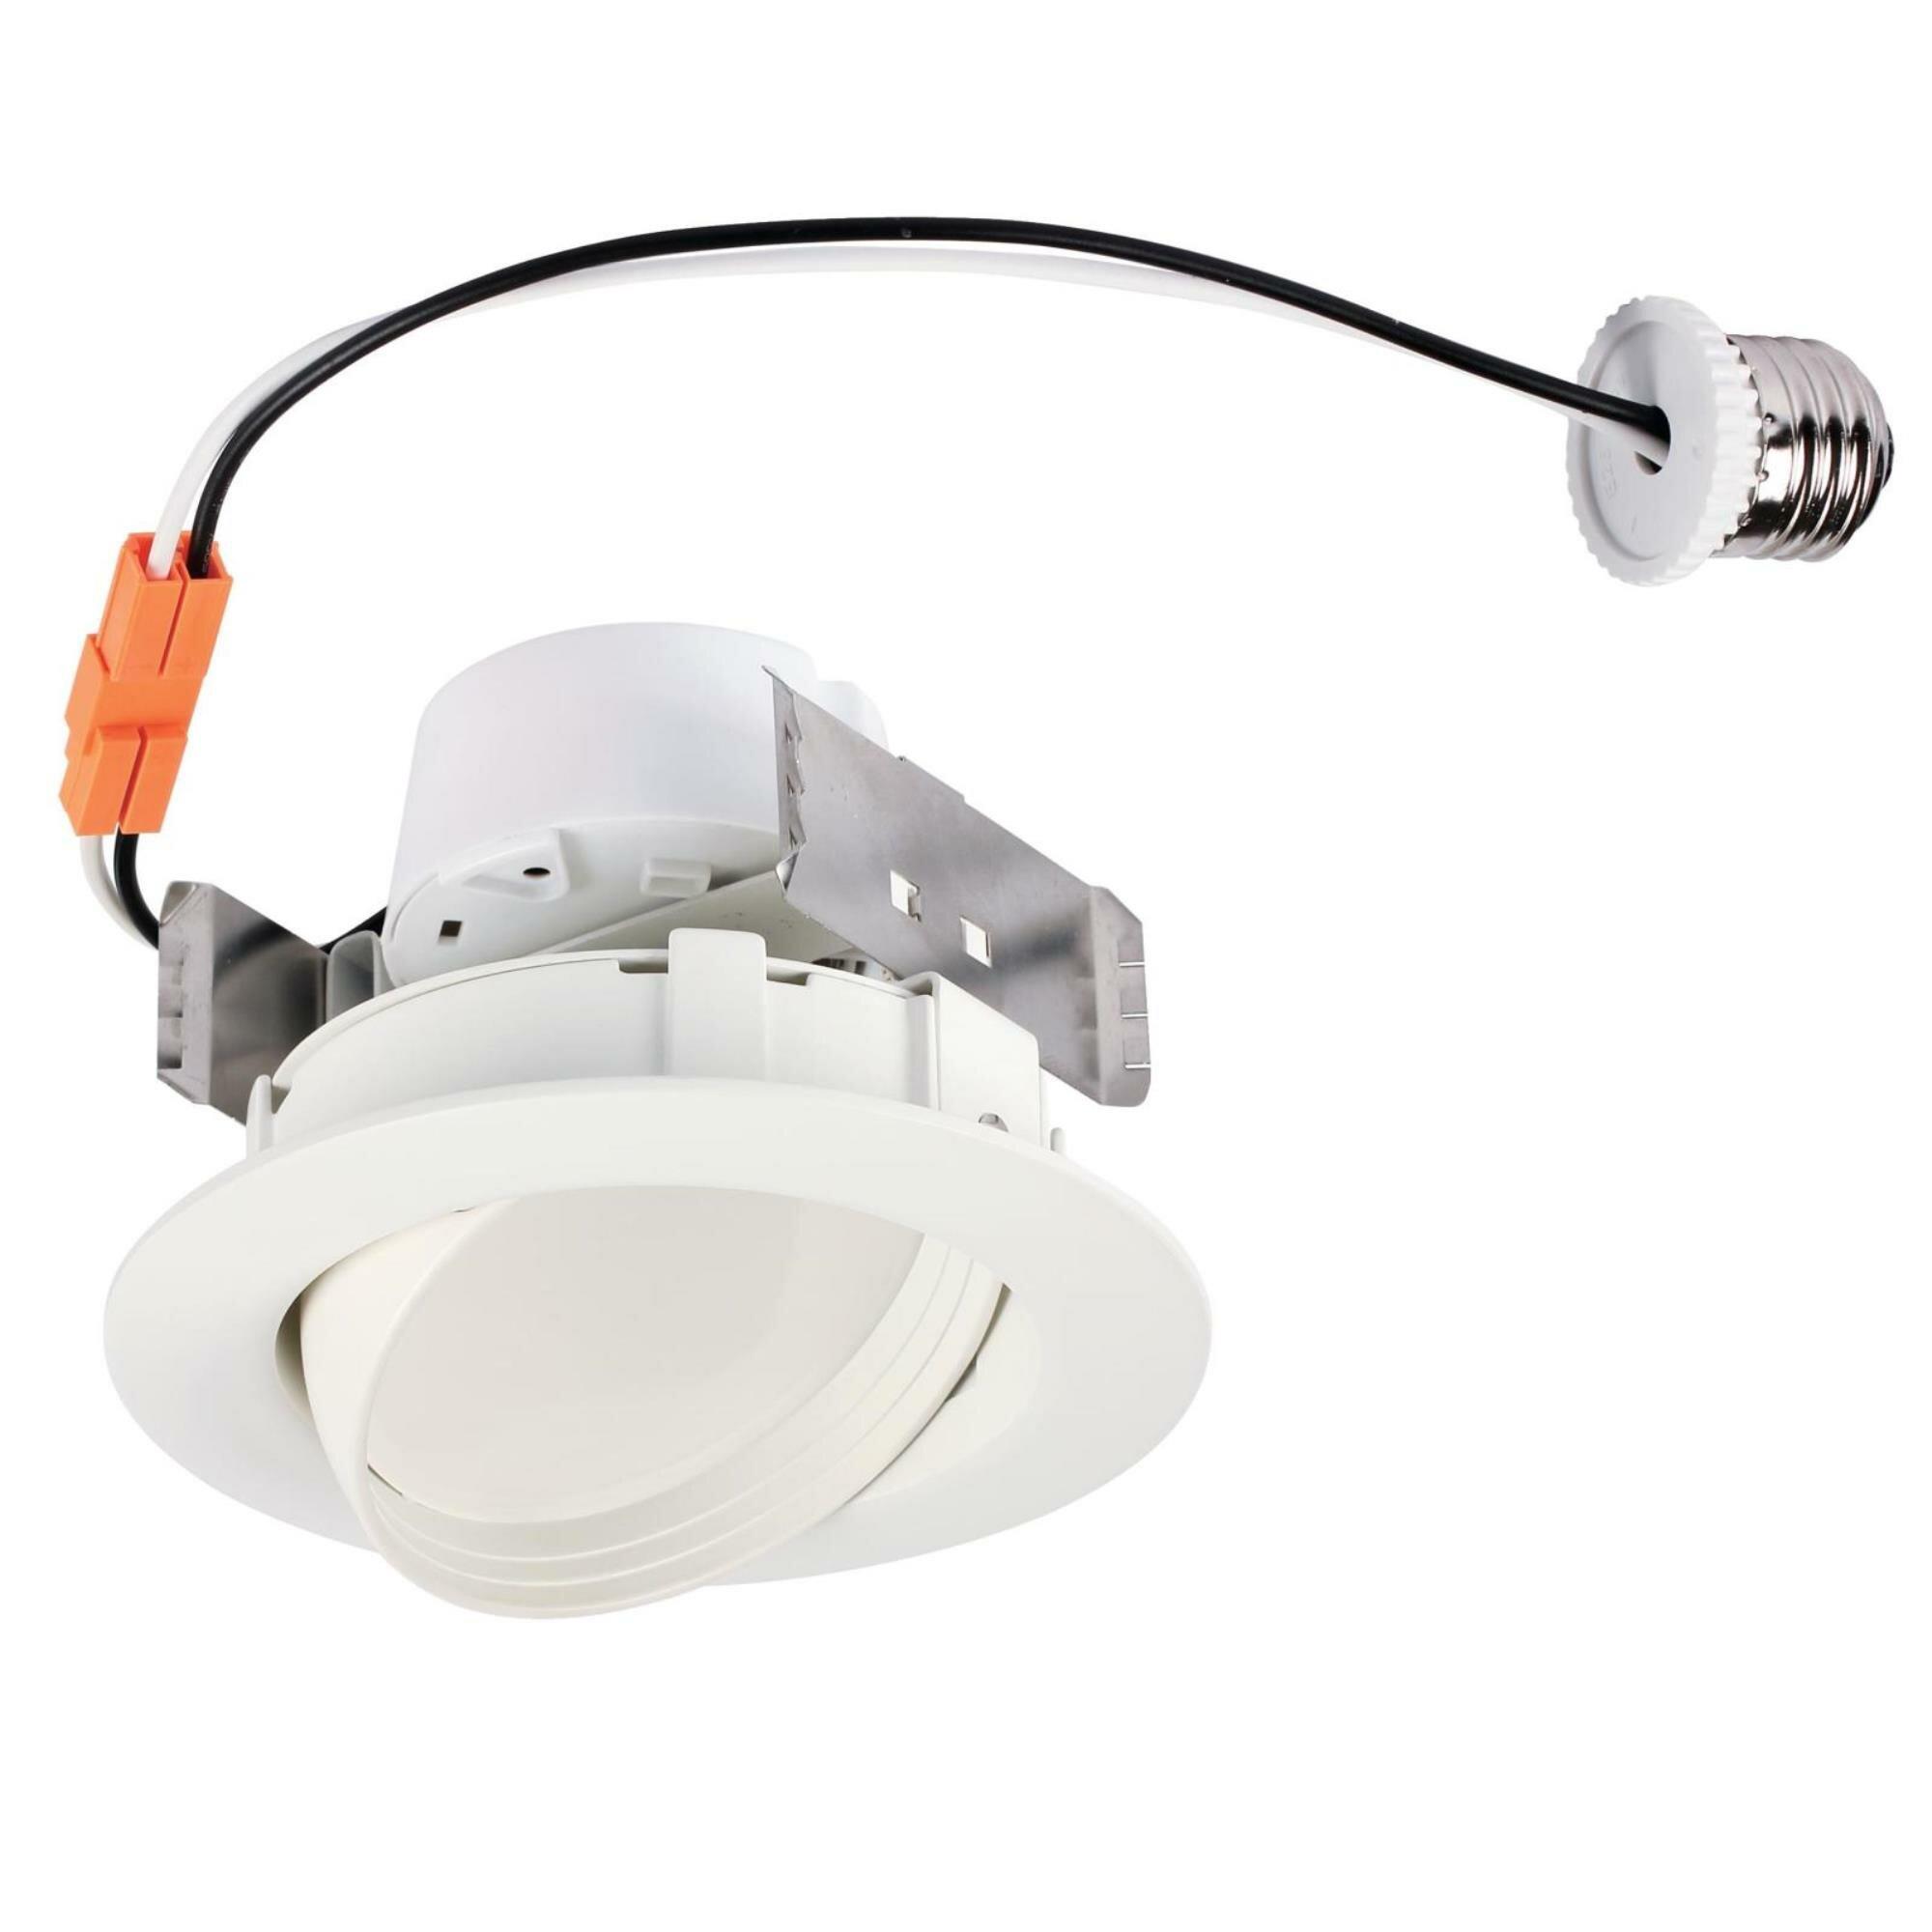 Westinghouse Lighting Remodel Led Retrofit Recessed Lighting Kit Wayfair